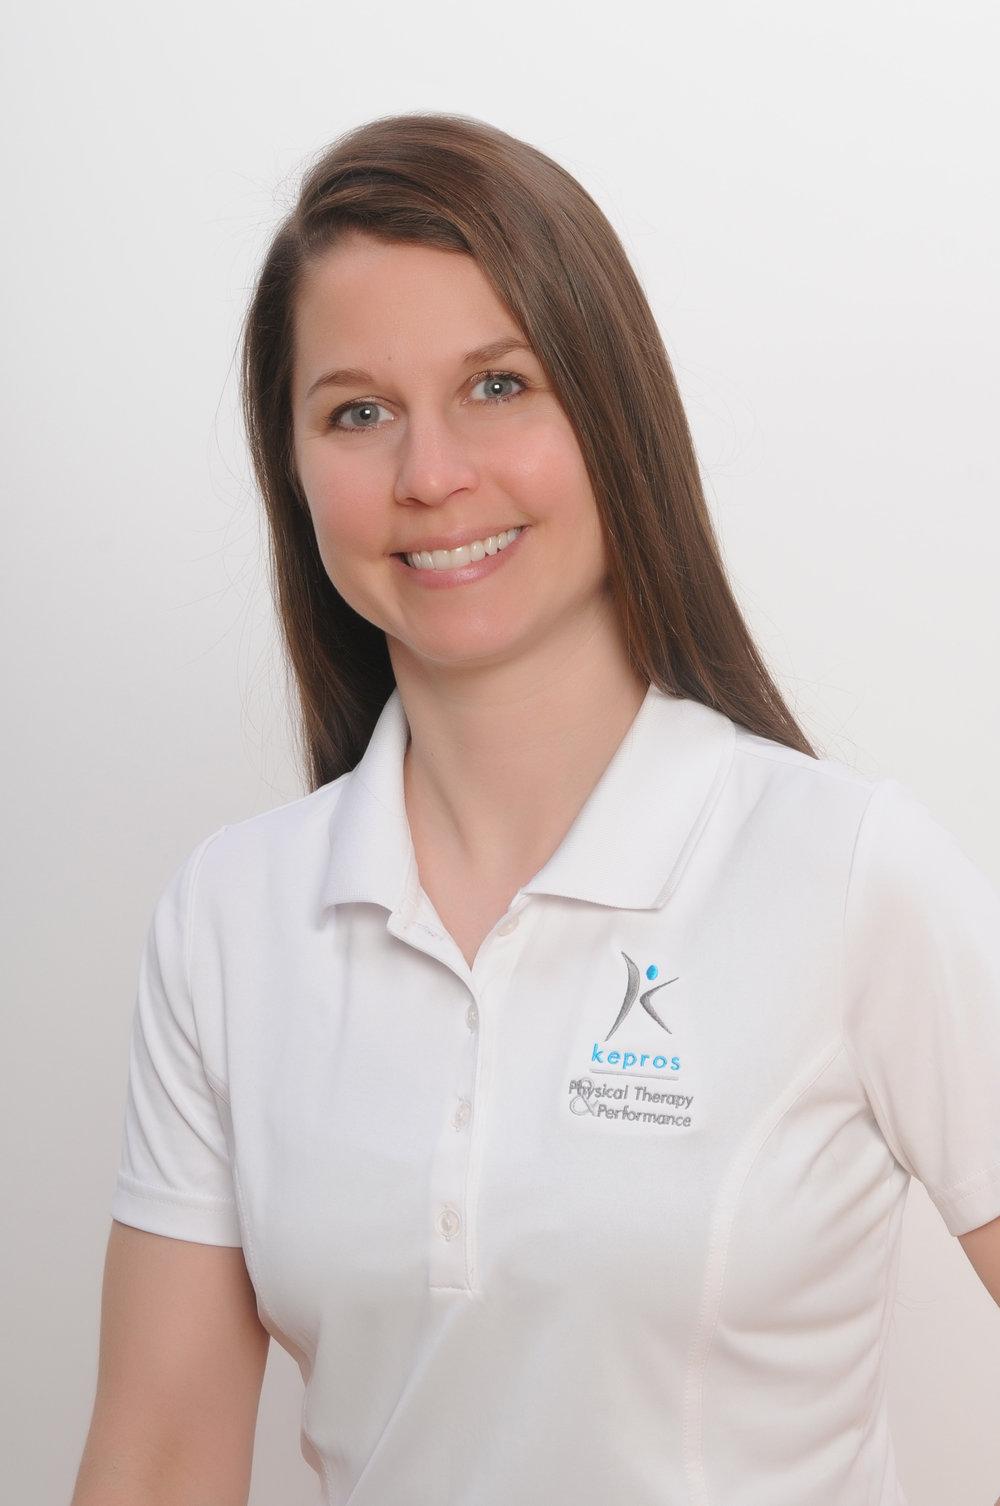 Carla Franck